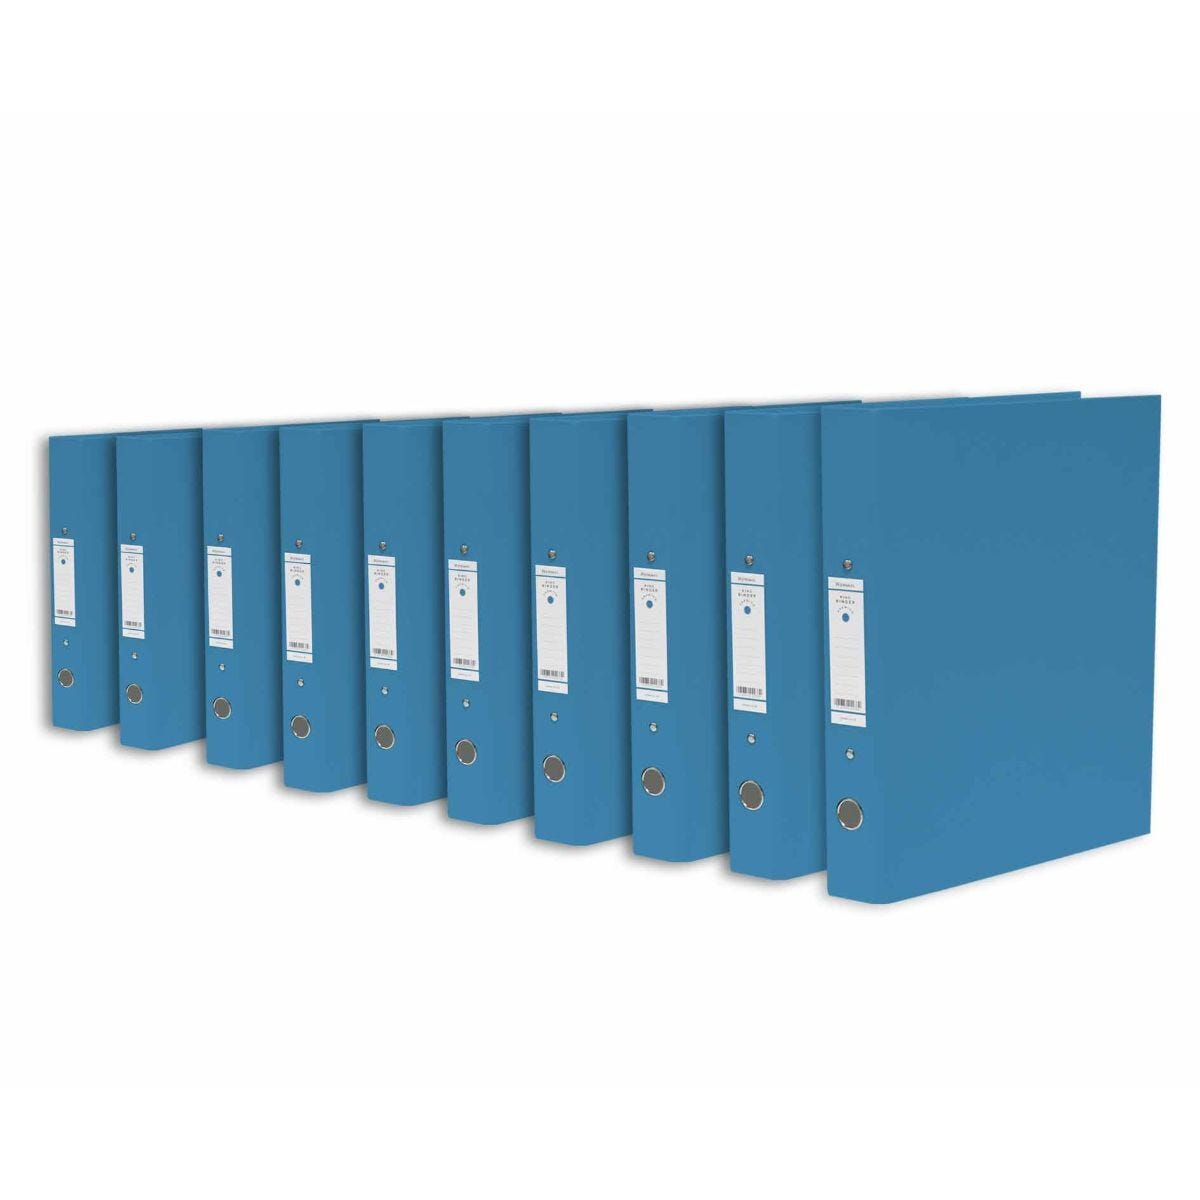 Ryman Premium Ring Binder Pack of 10 Dark Blue